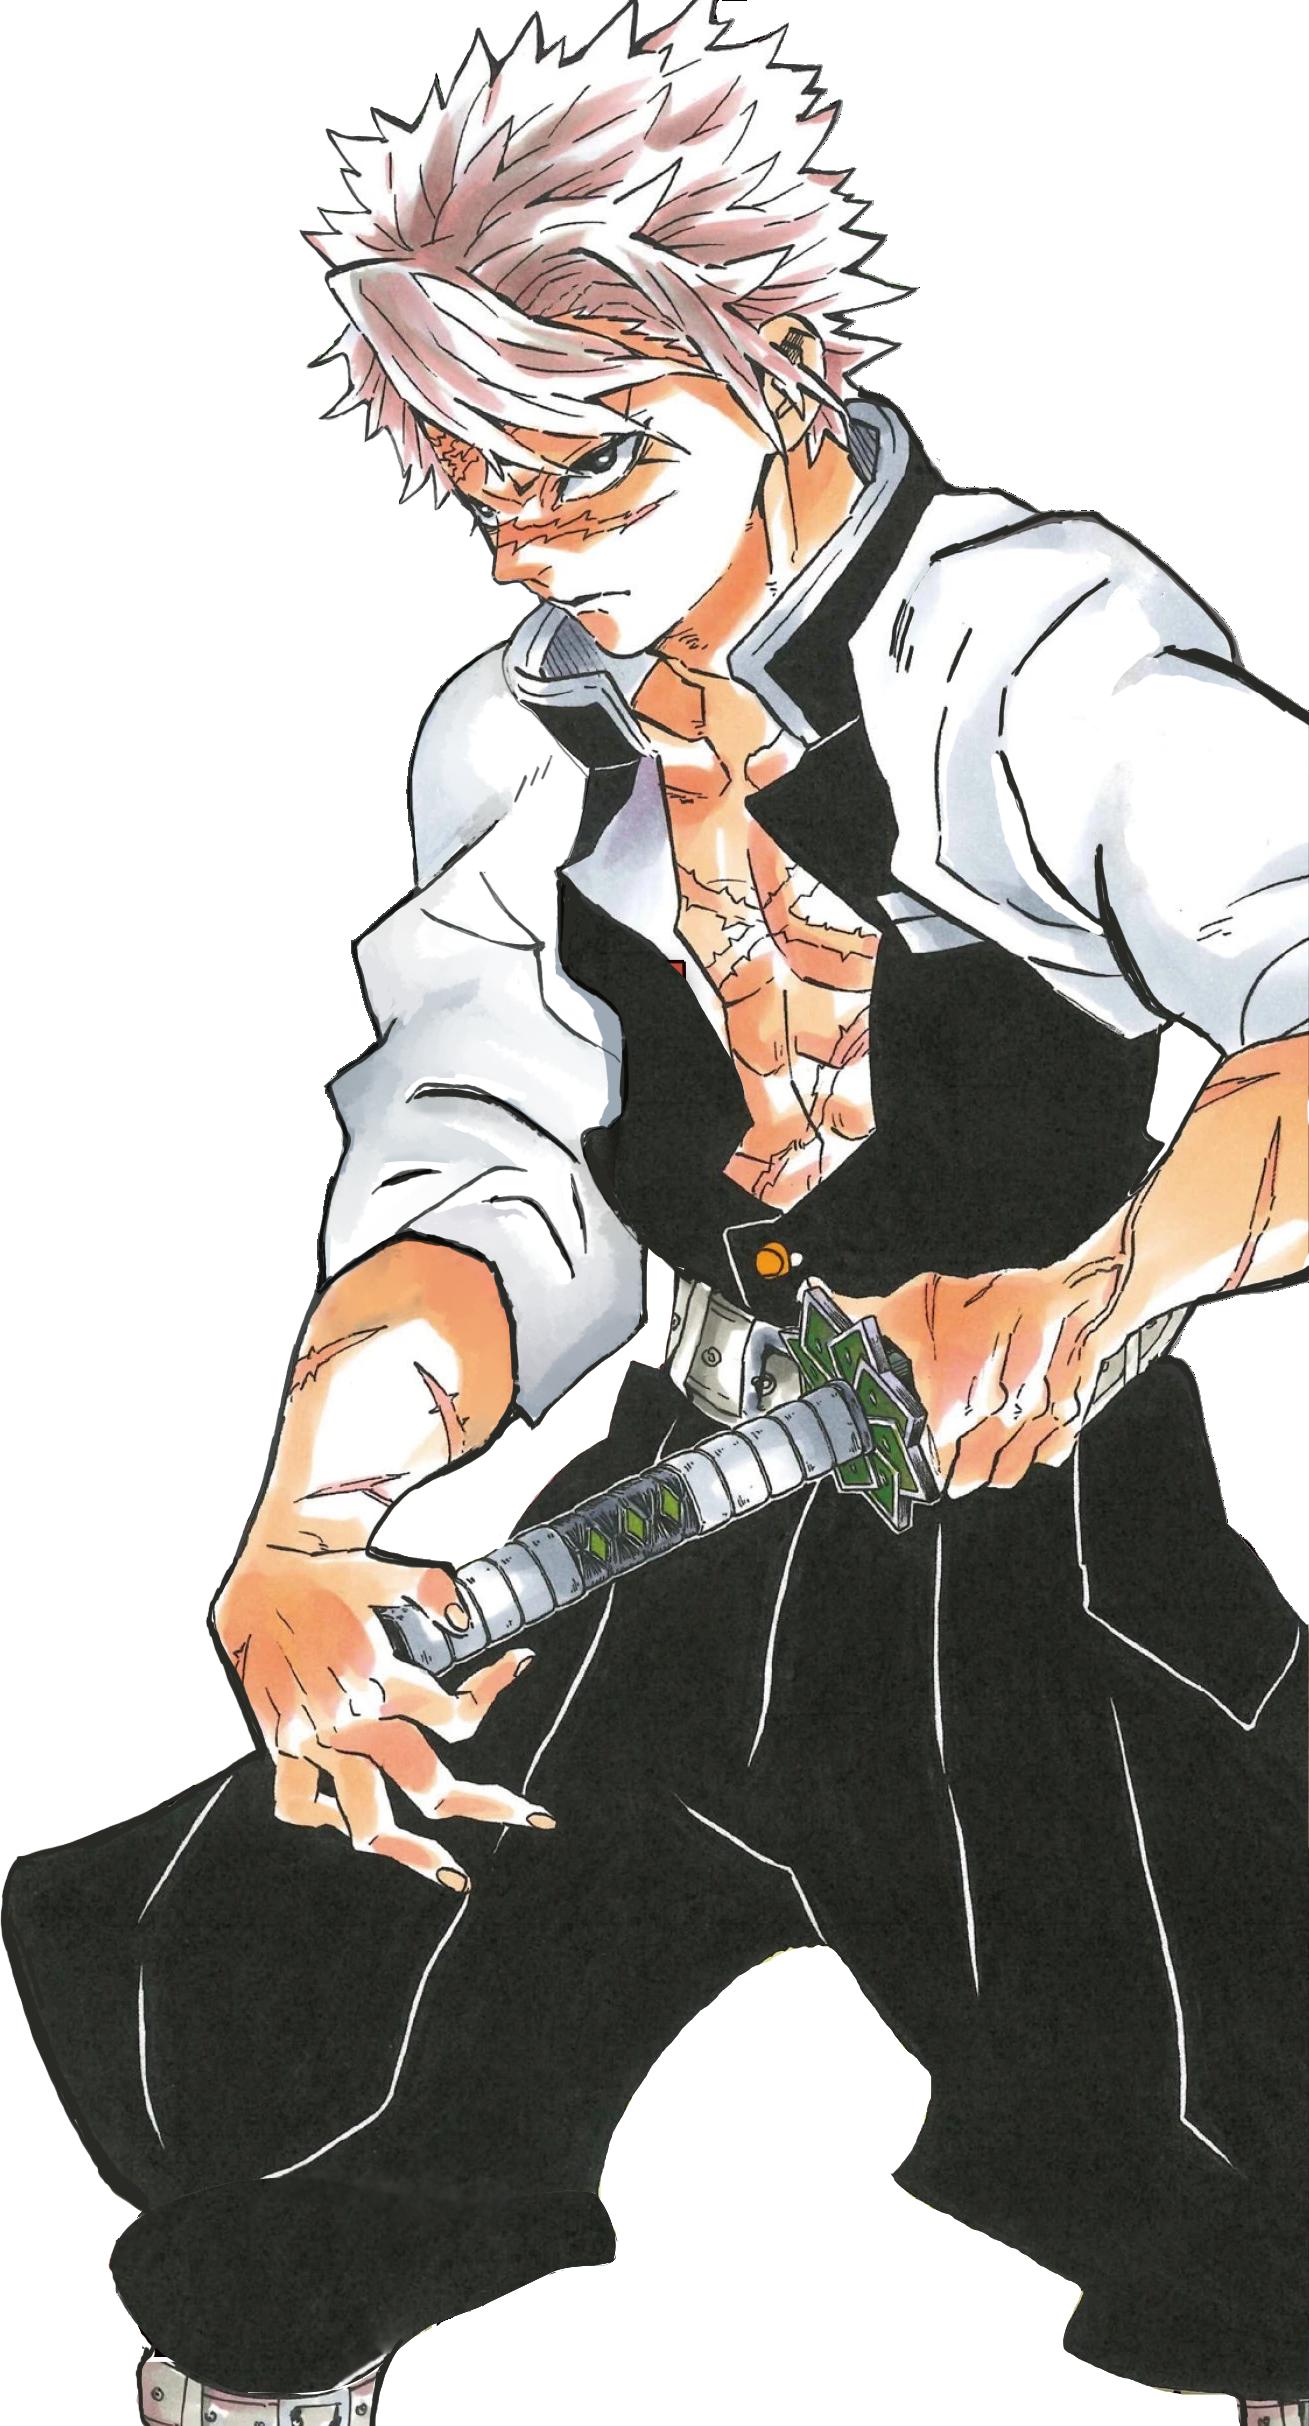 Sanemi Shinazugawa Kimetsu No Yaiba Wikia Fandom Powered By Wikia Anime Demon Slayer Anime Anime